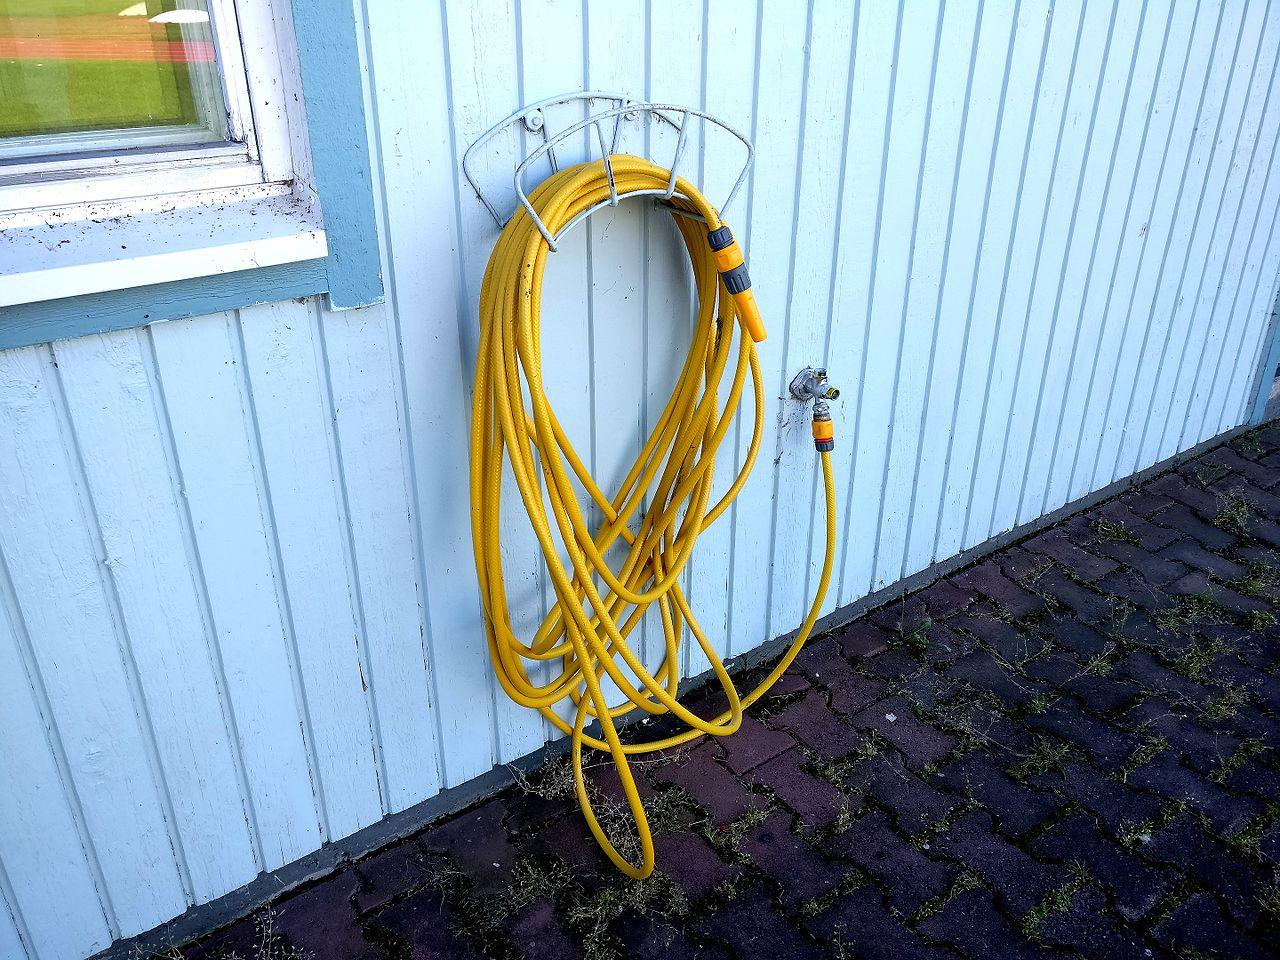 A garden hose hanging on a metal hanger